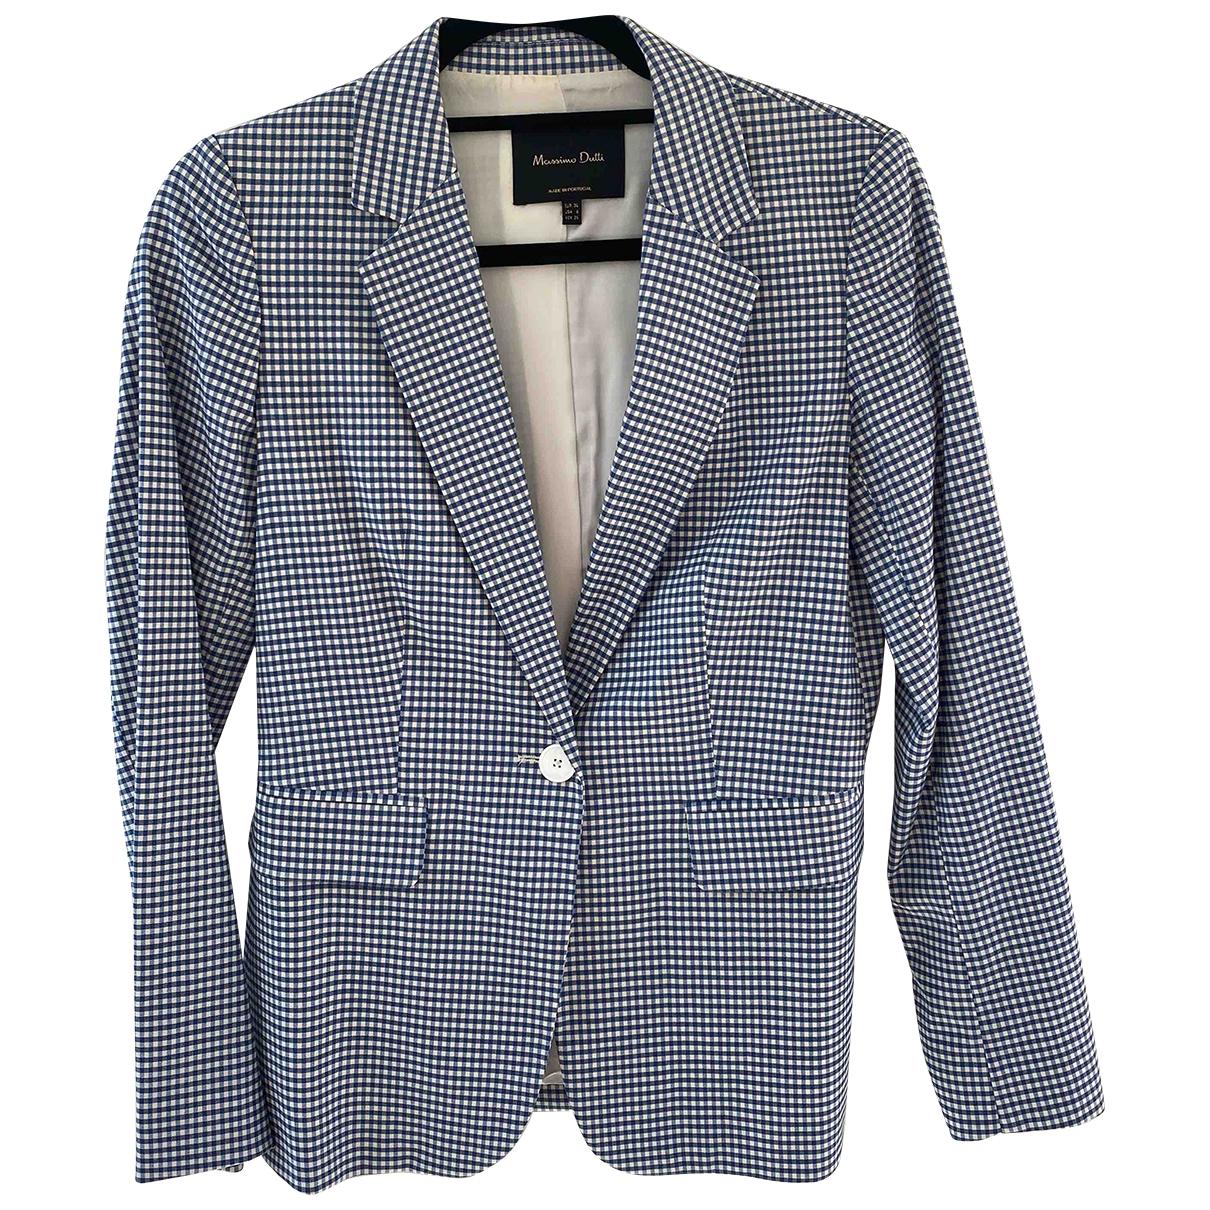 Massimo Dutti \N Jacke in  Blau Wolle